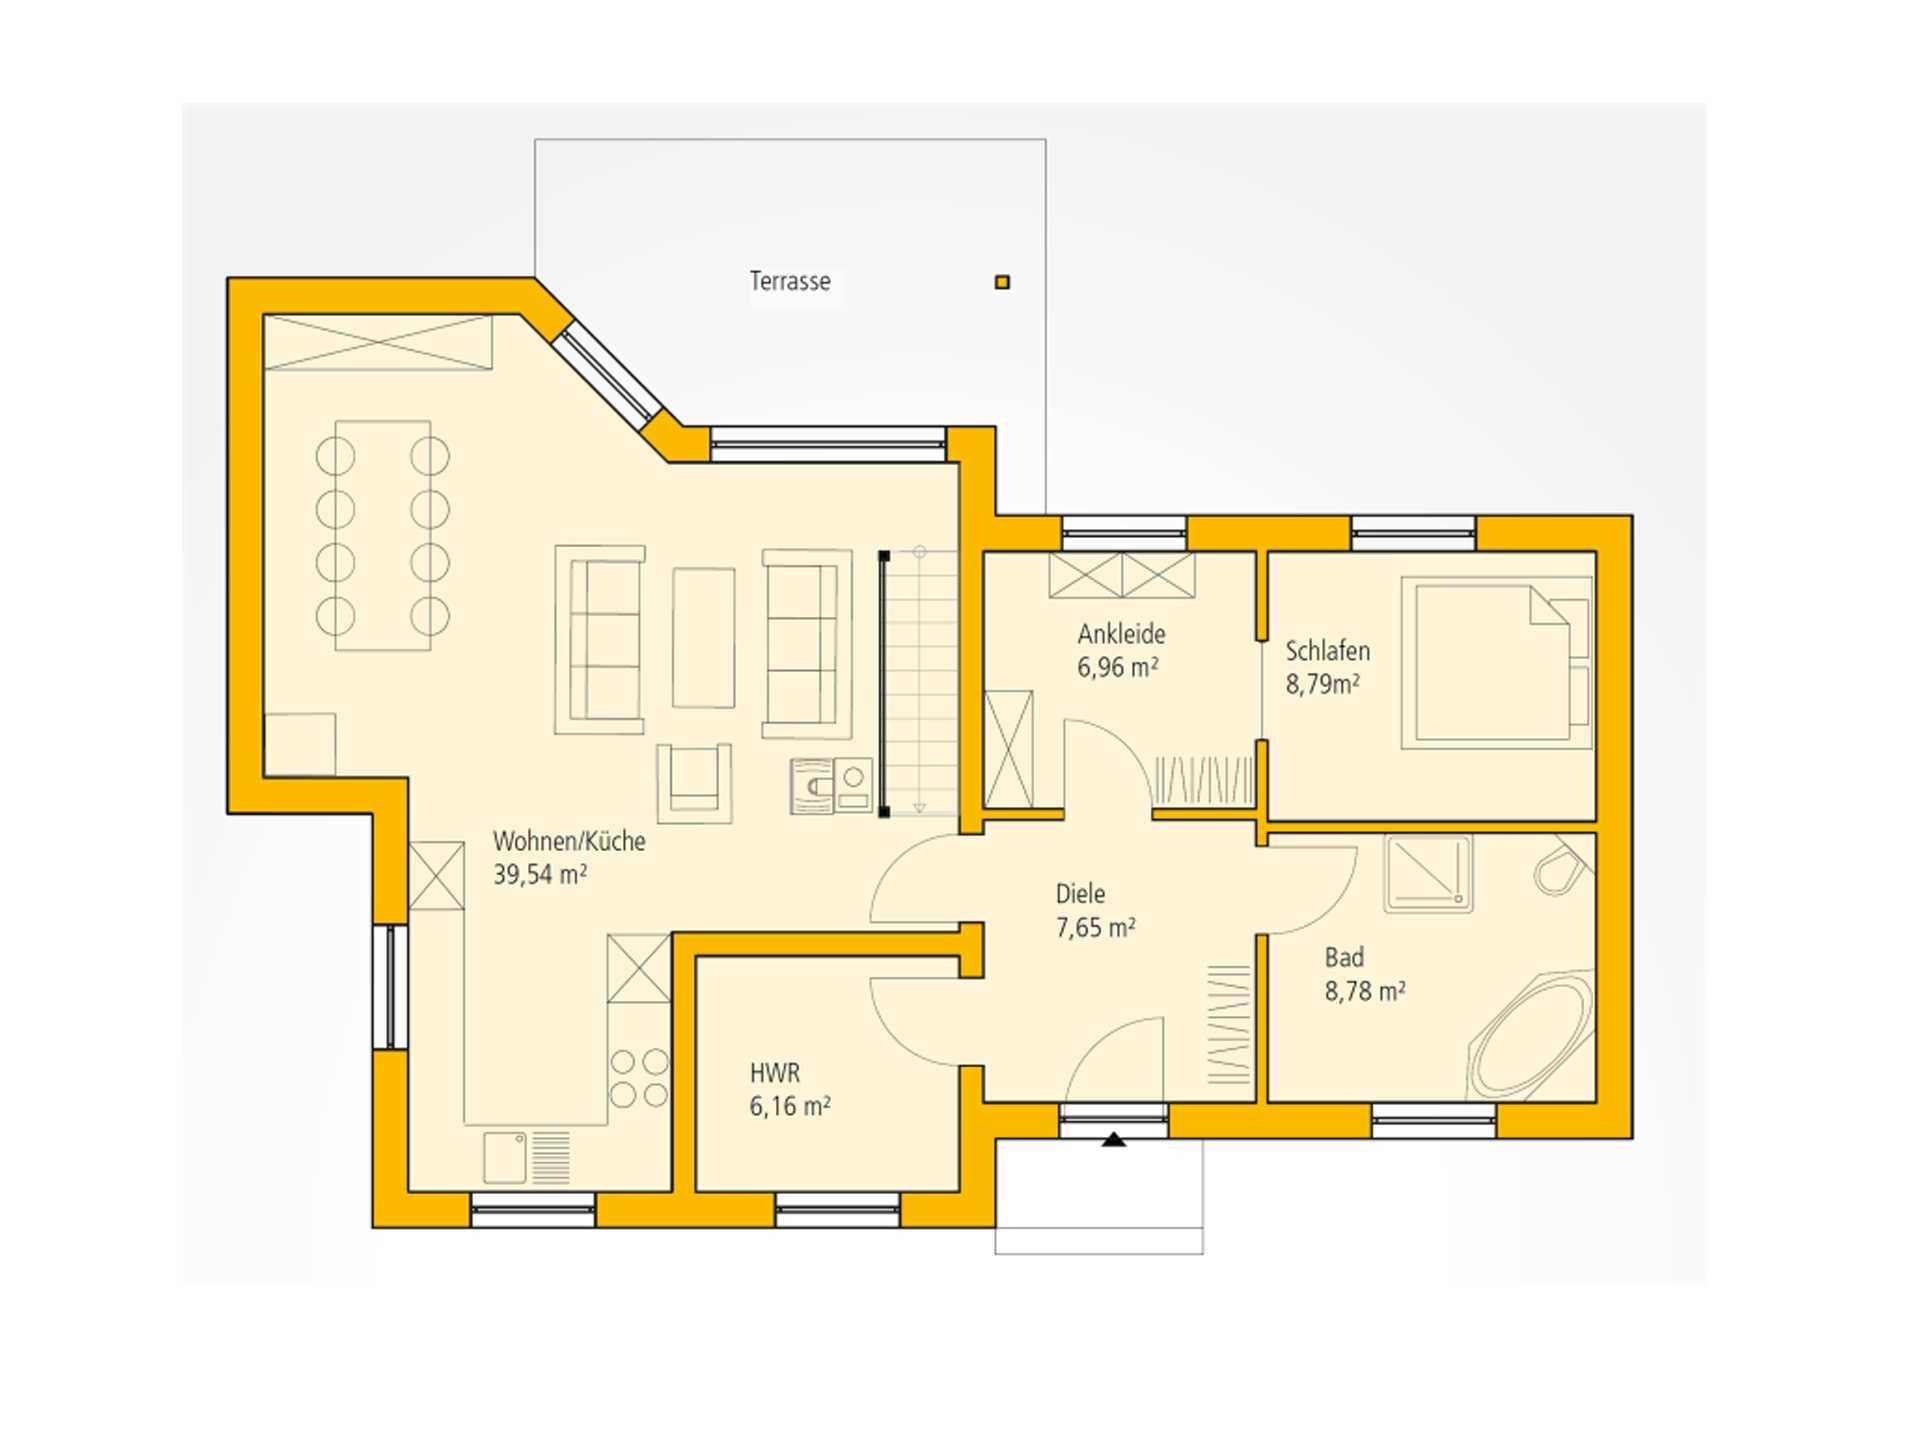 Ankleidezimmer Planen Musterhaus Net